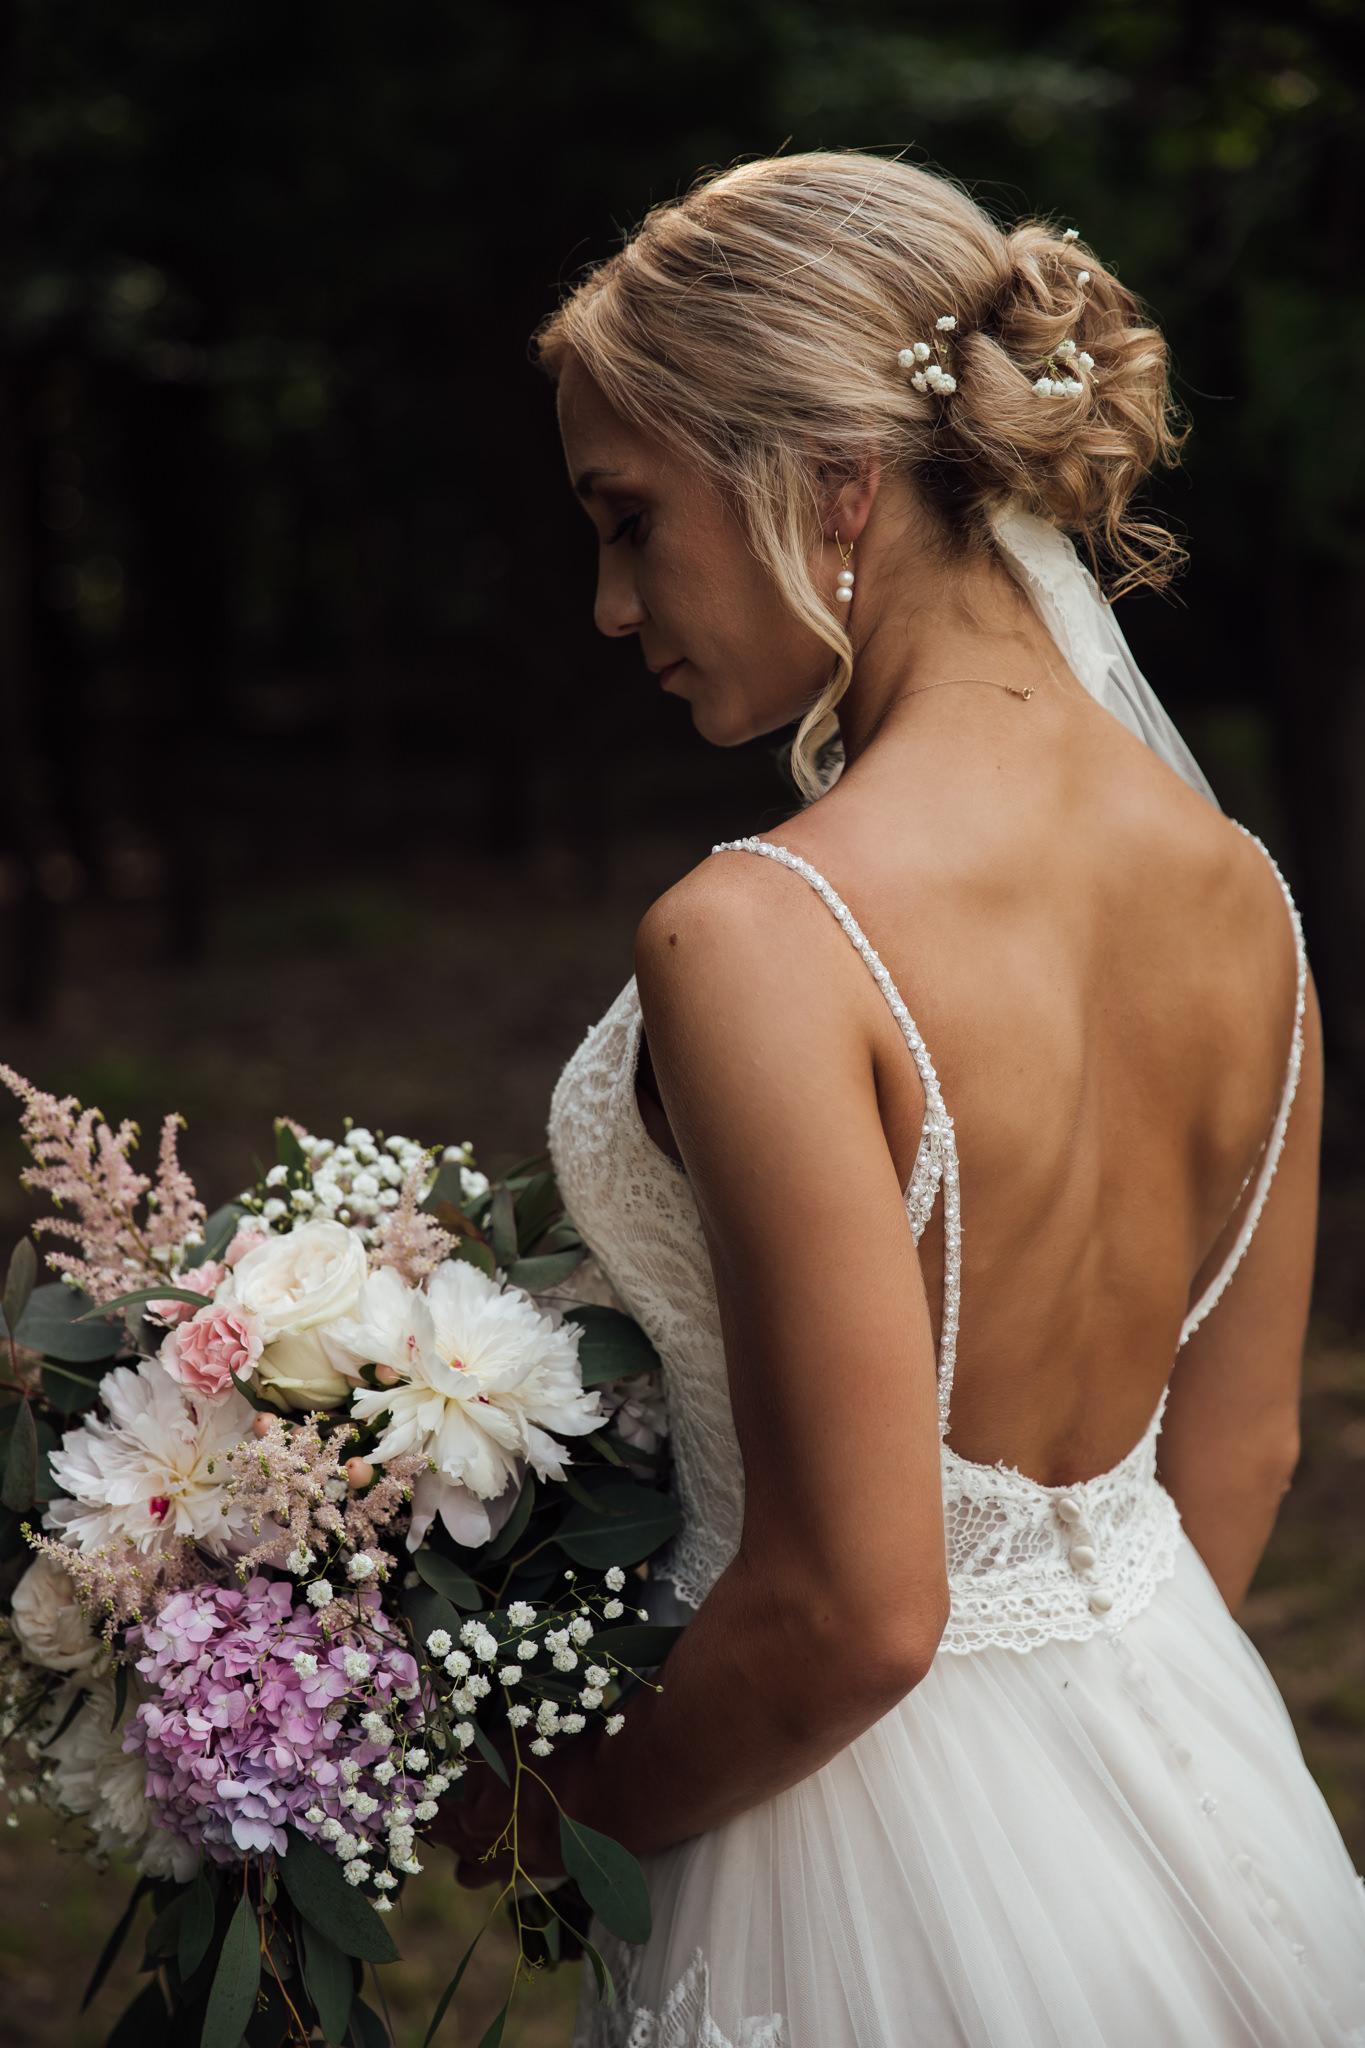 backyard-wedding-thewarmtharoundyou-lexy-branson-46.jpg